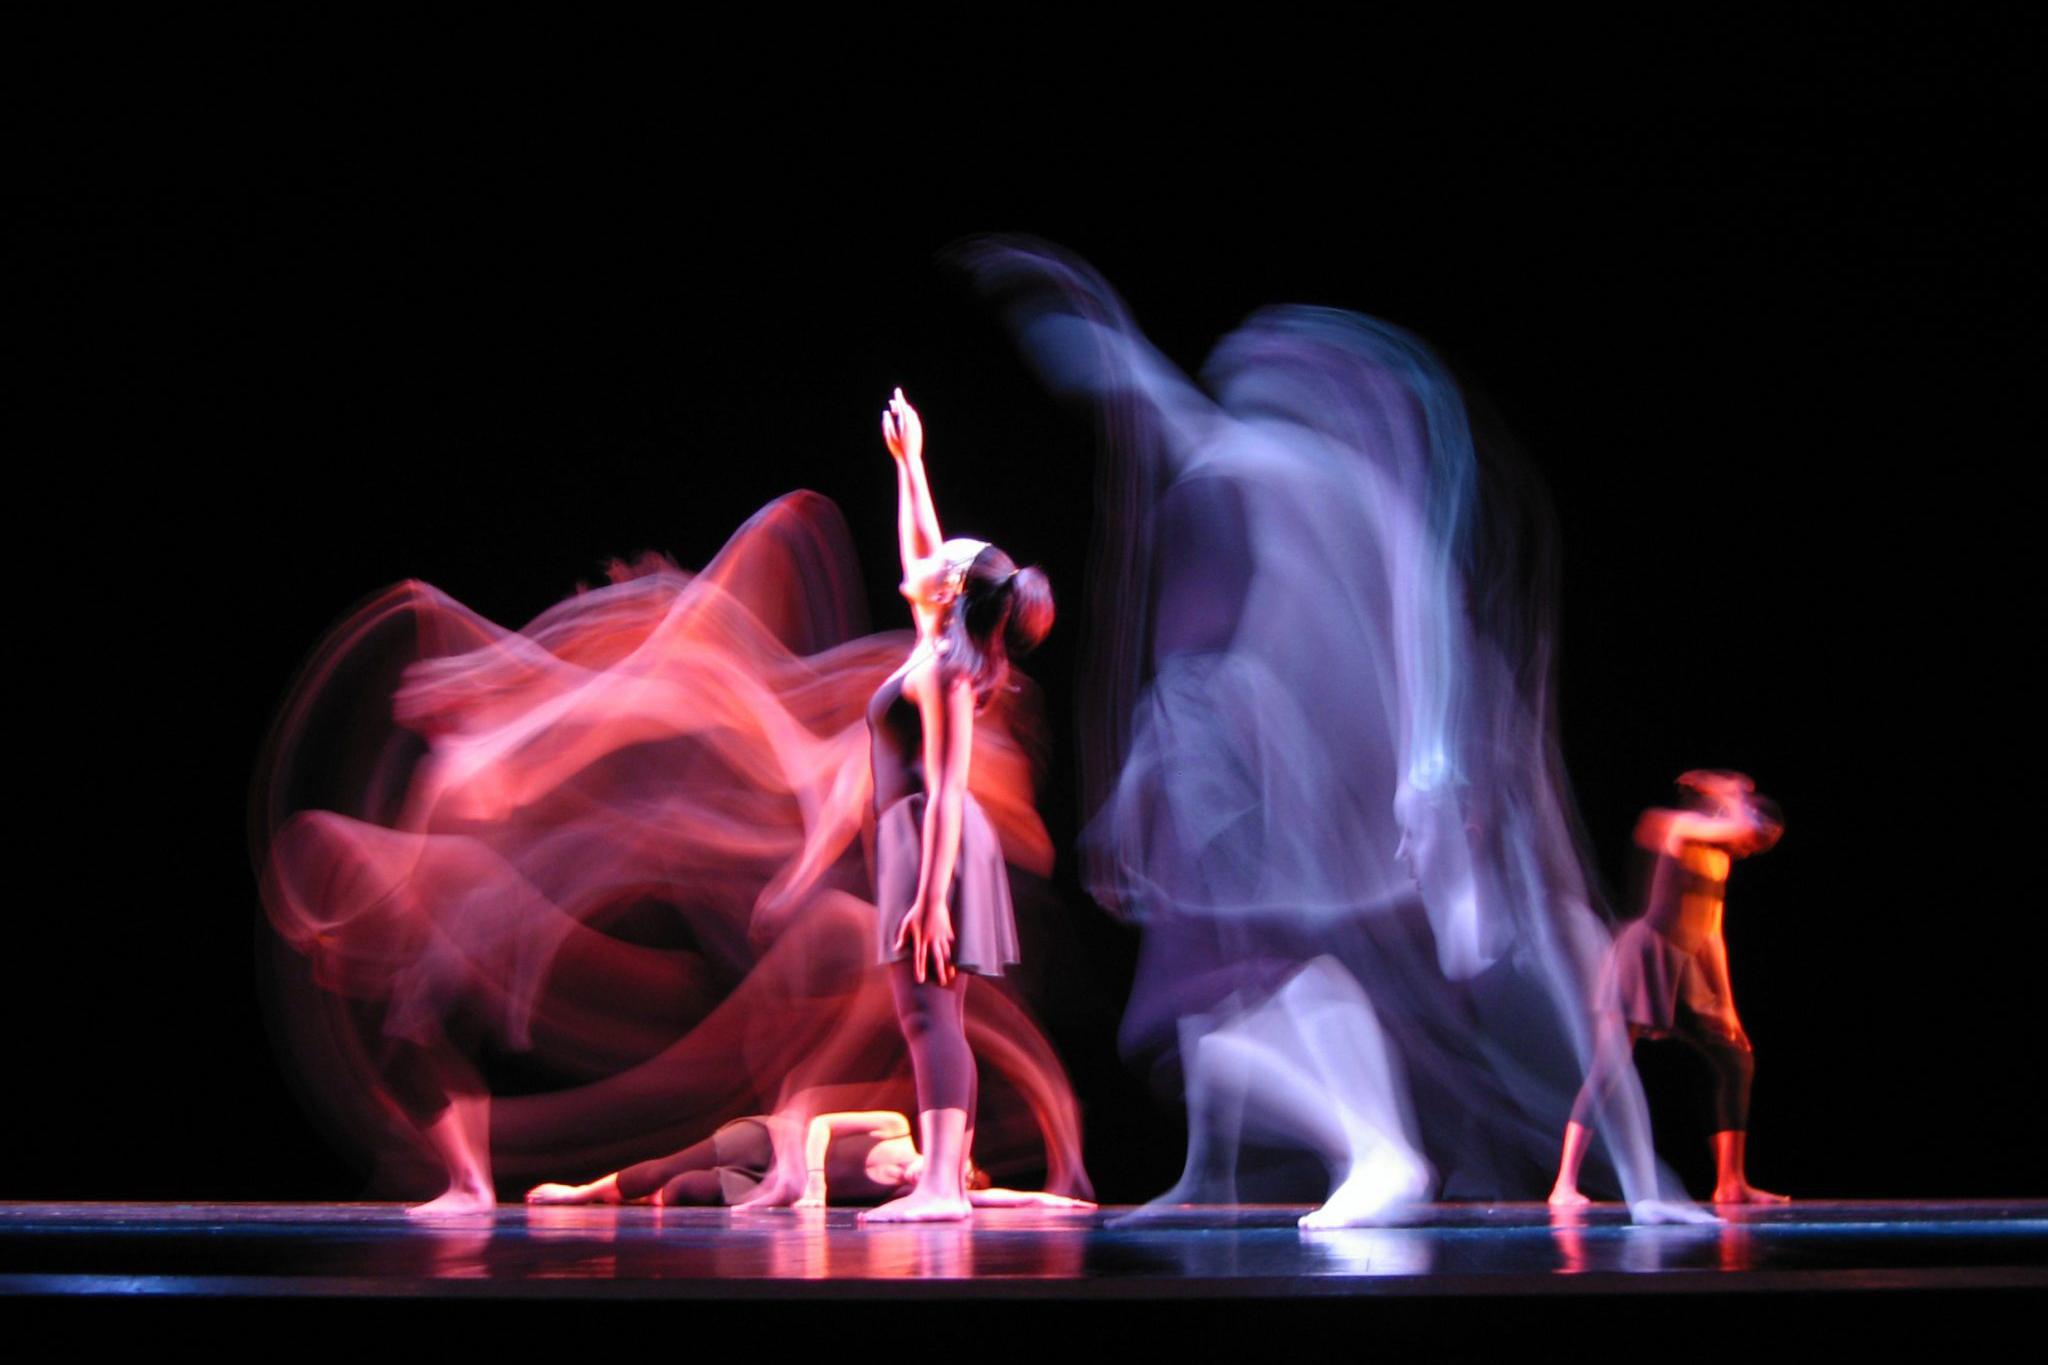 Light Moves © Mat Lazenby